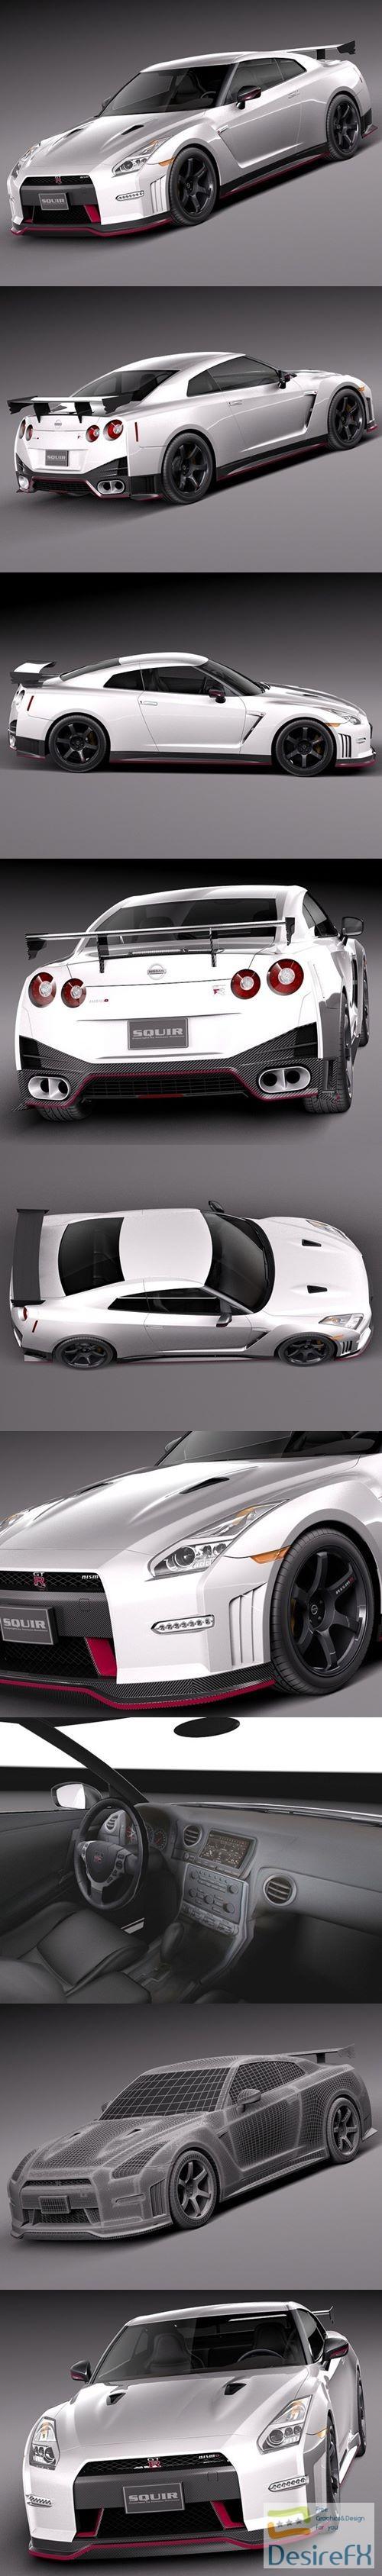 Nissan GT-R Nismo 2015 3D Model